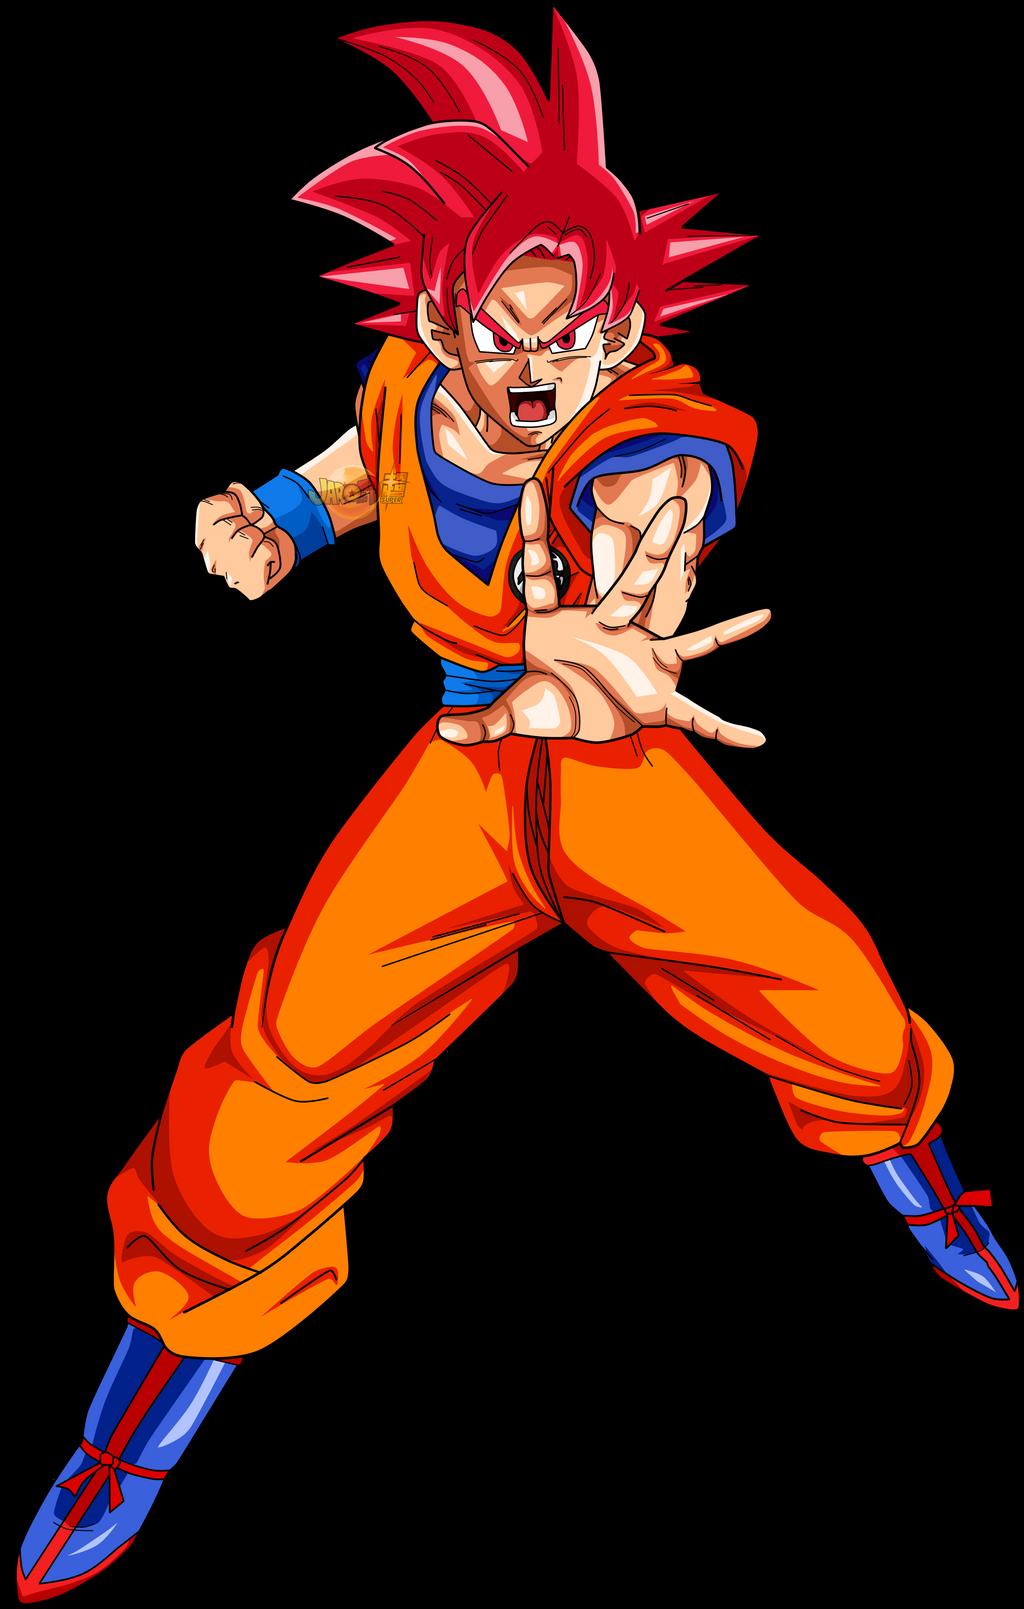 Goku ssj god v2 by jaredsongohan on deviantart - Sangoku super saiyan god ...